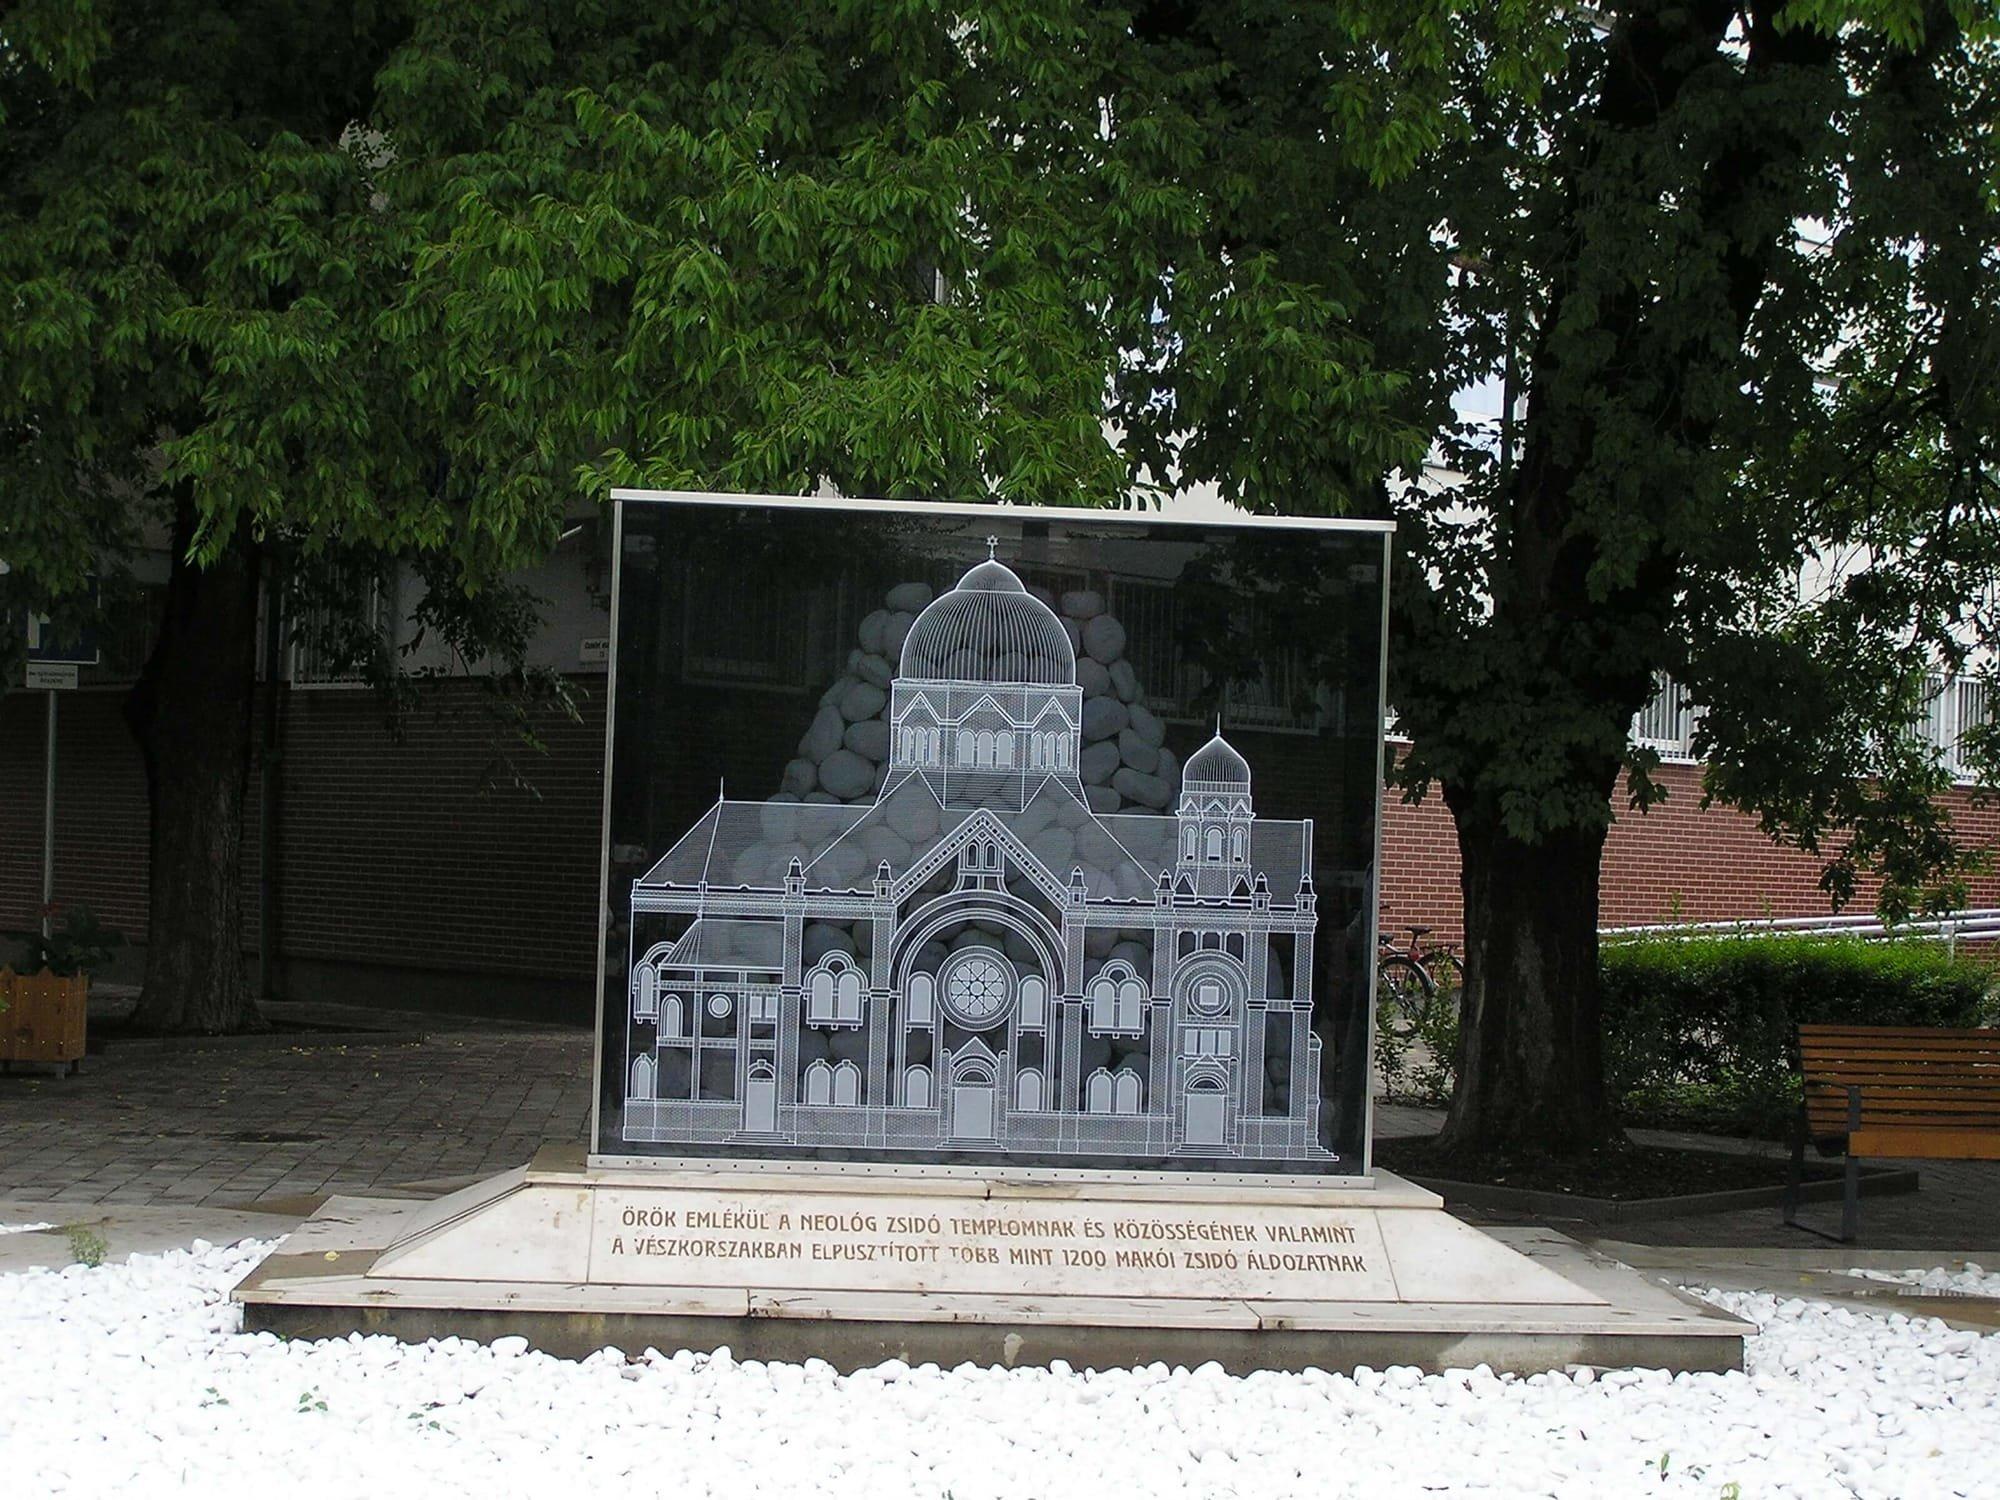 placa memoriala sinagoga neologa Mako